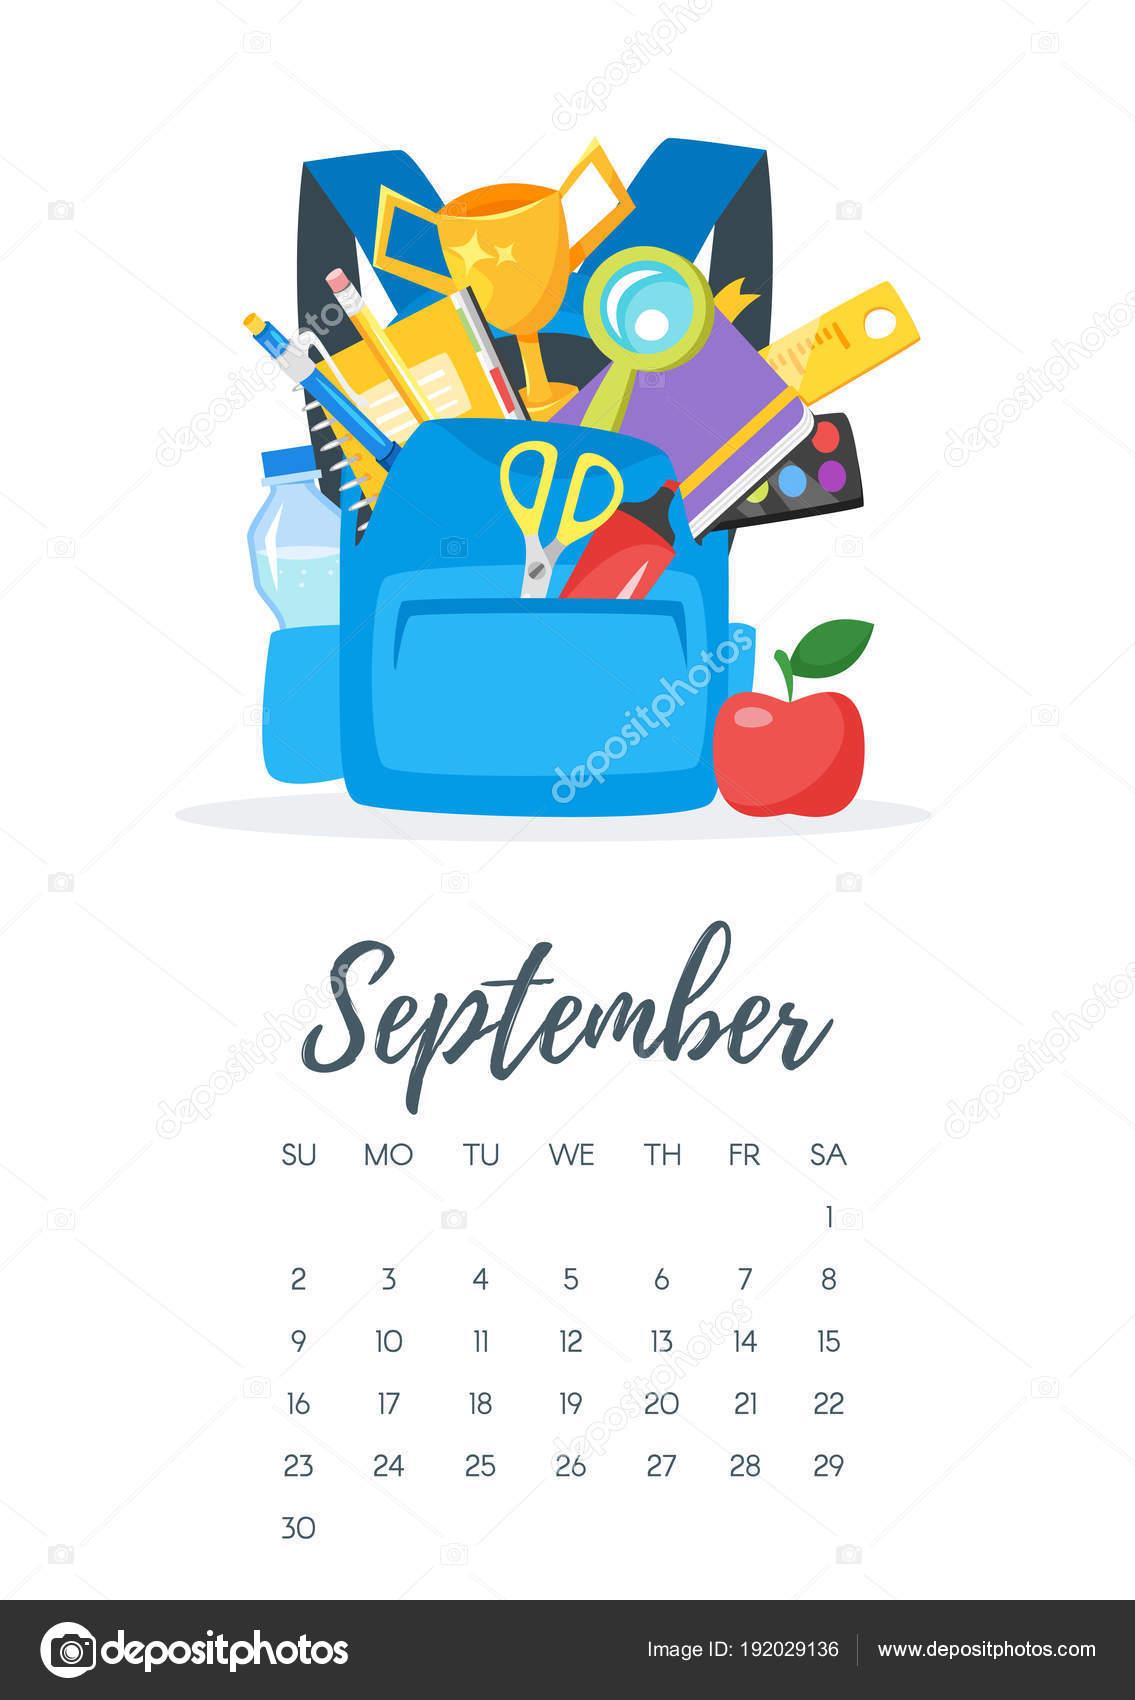 Calendario De Septiembre 2019 Para Imprimir Animado.Animado 16 De Septiembre Pagina De Calendario De Ano